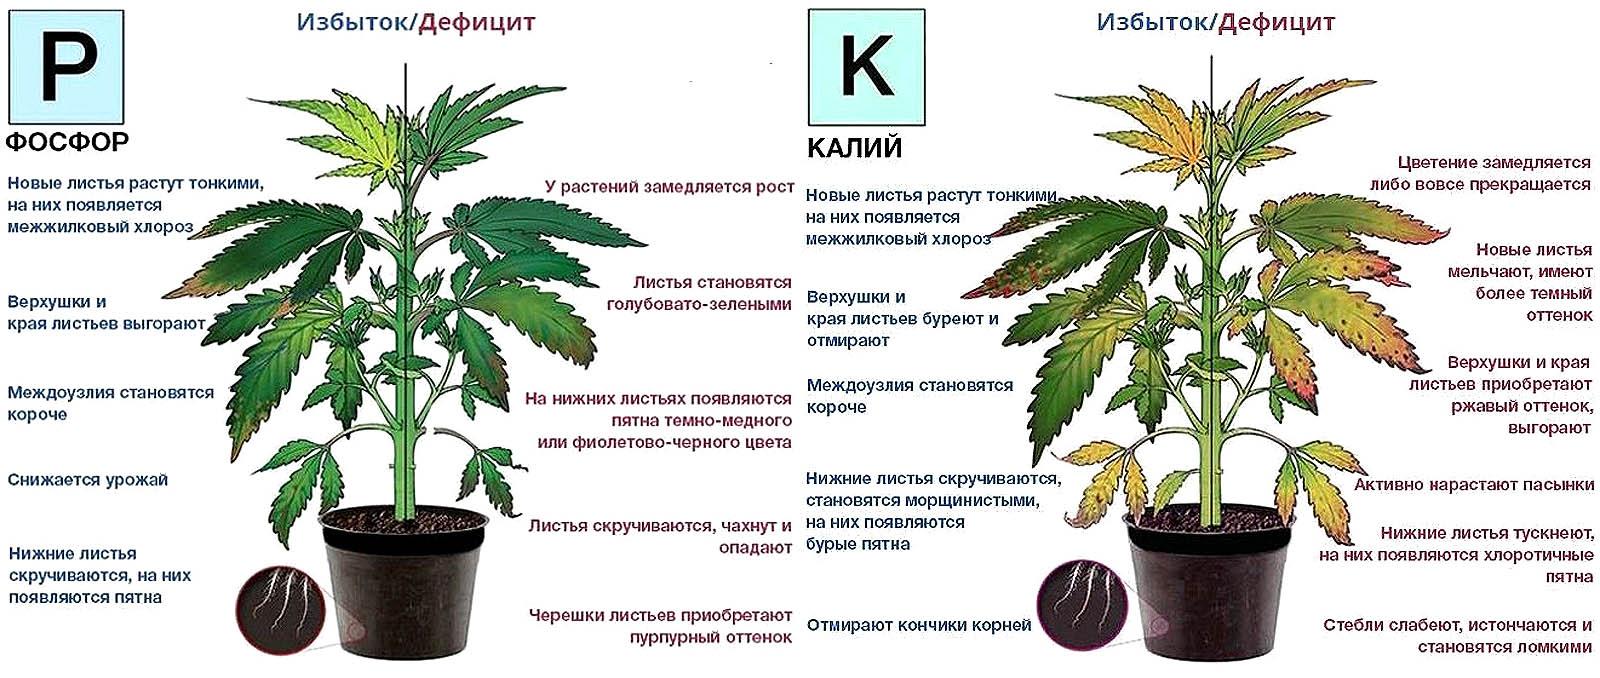 Признаки избытка и недостатка в растениях фосфора и калия